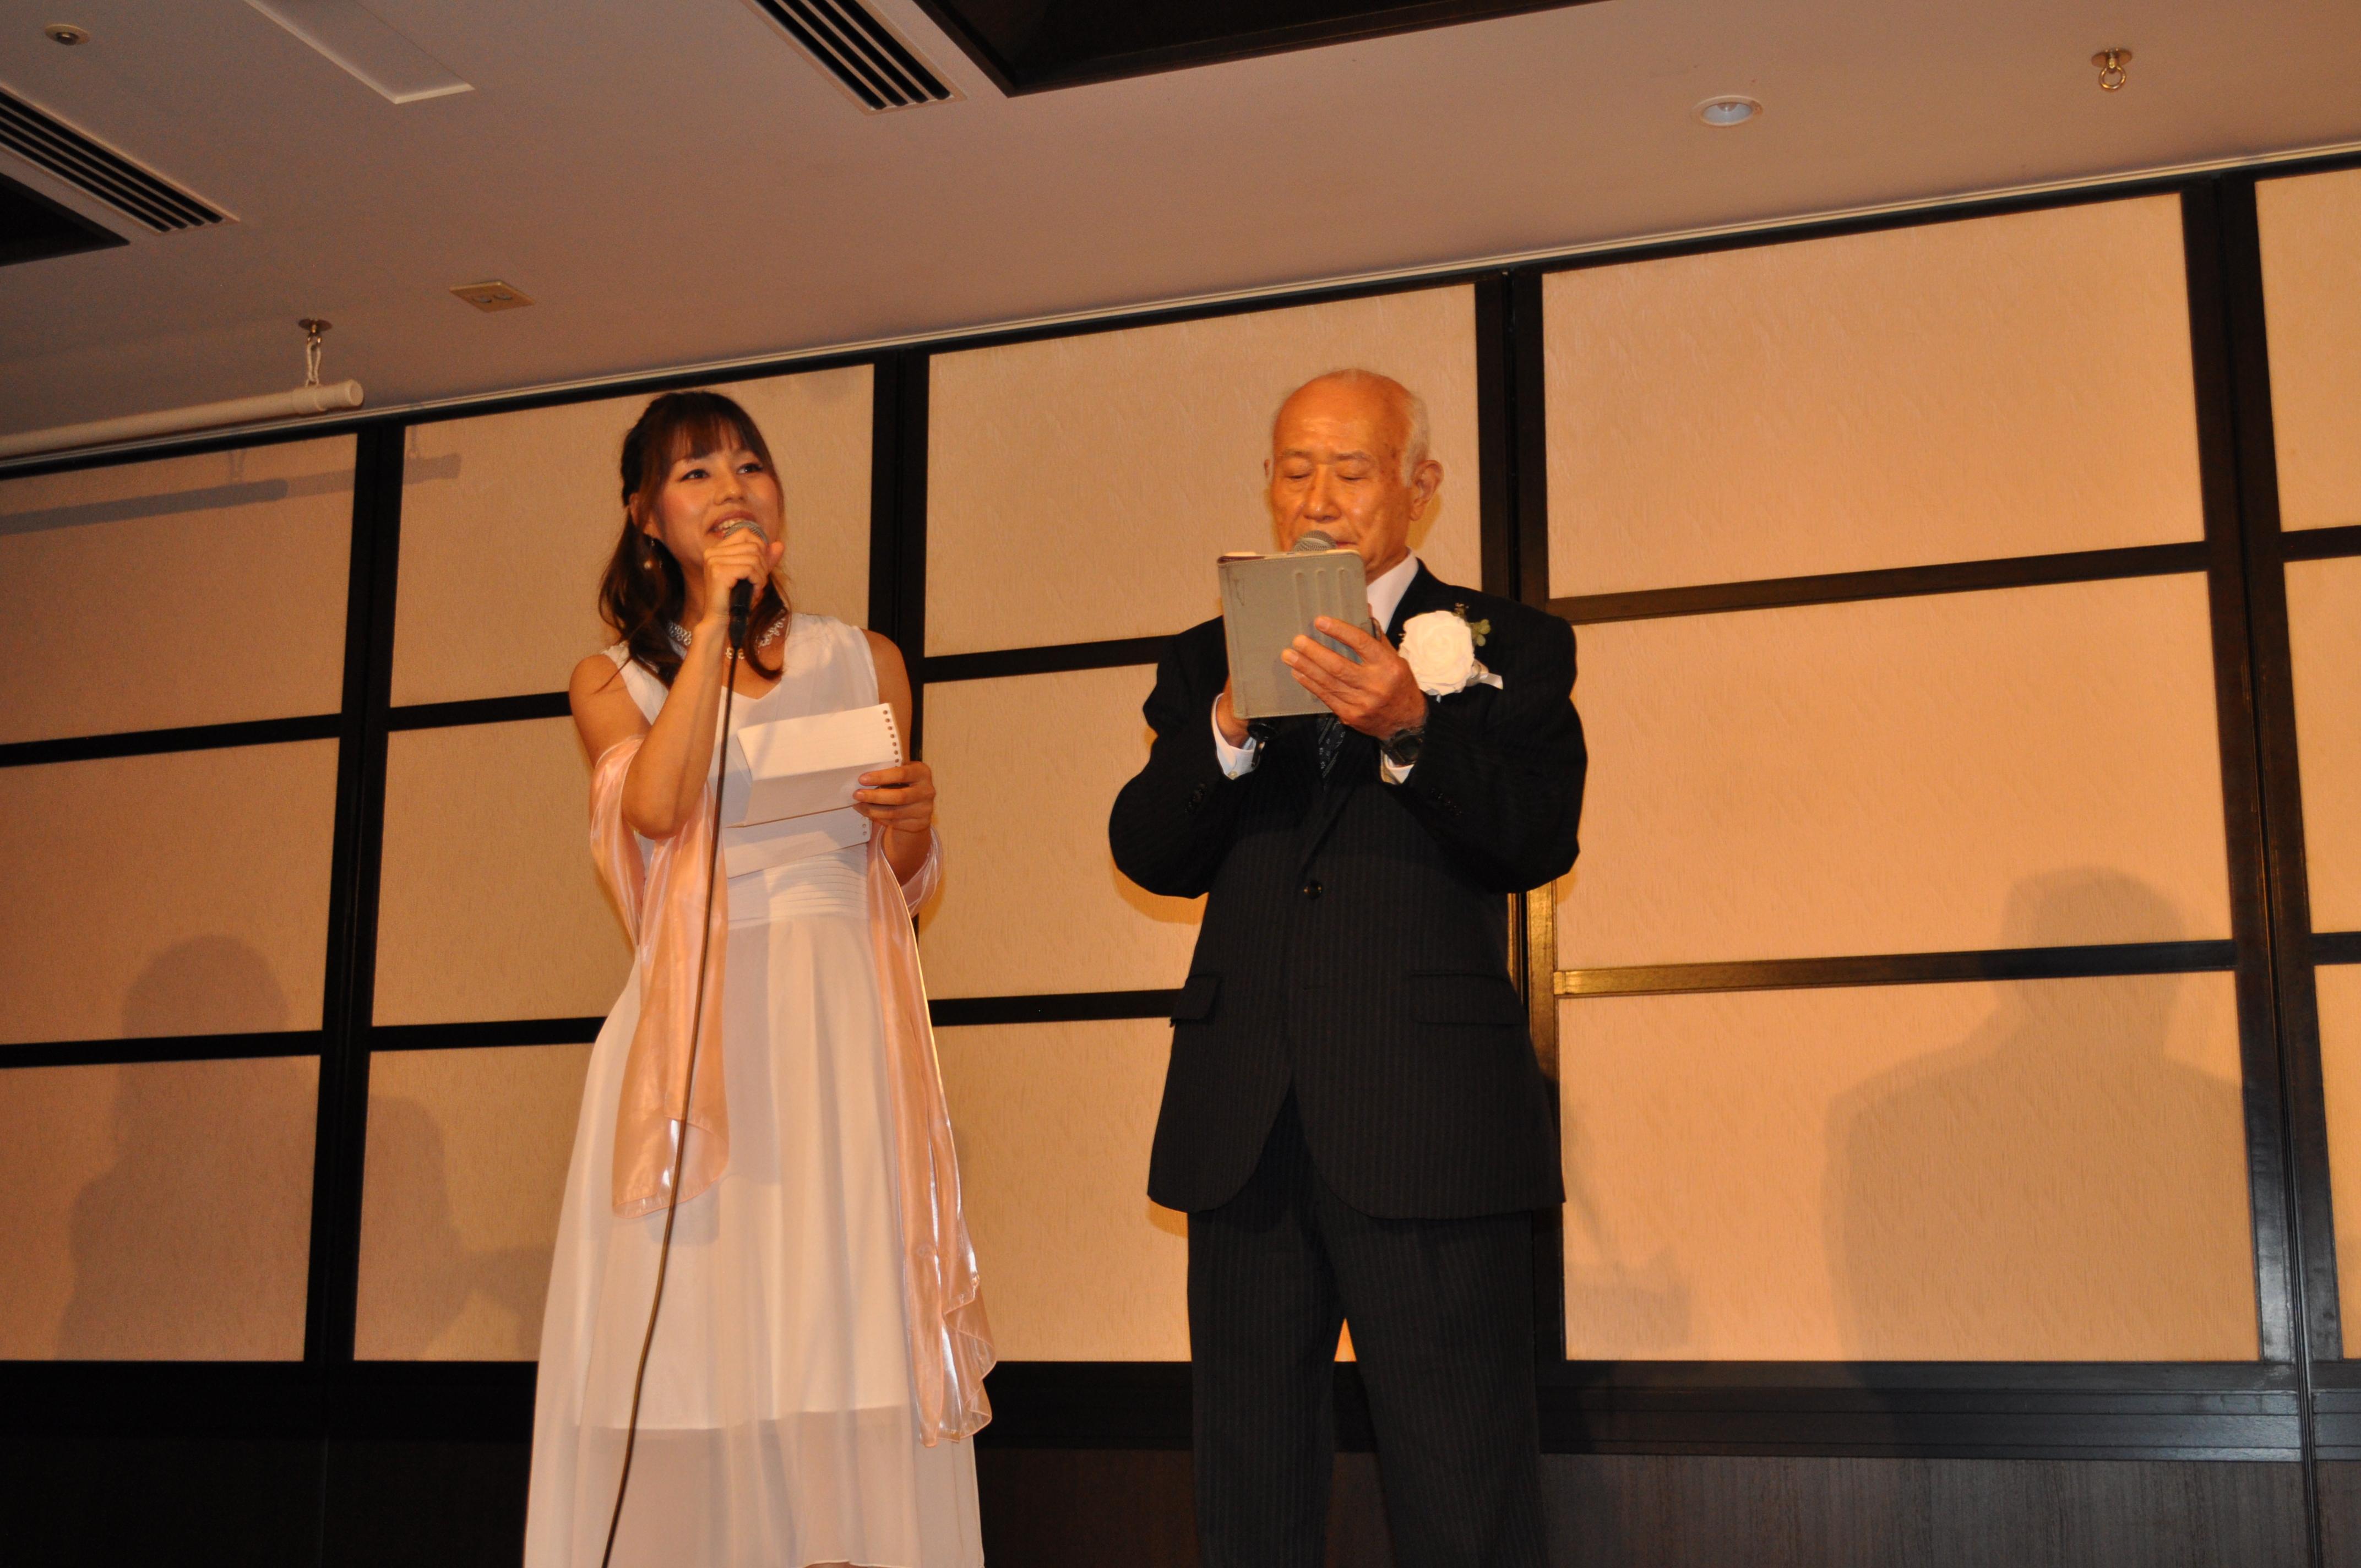 DSC 0508 - 第6回思風会全国大会2018in東京開催